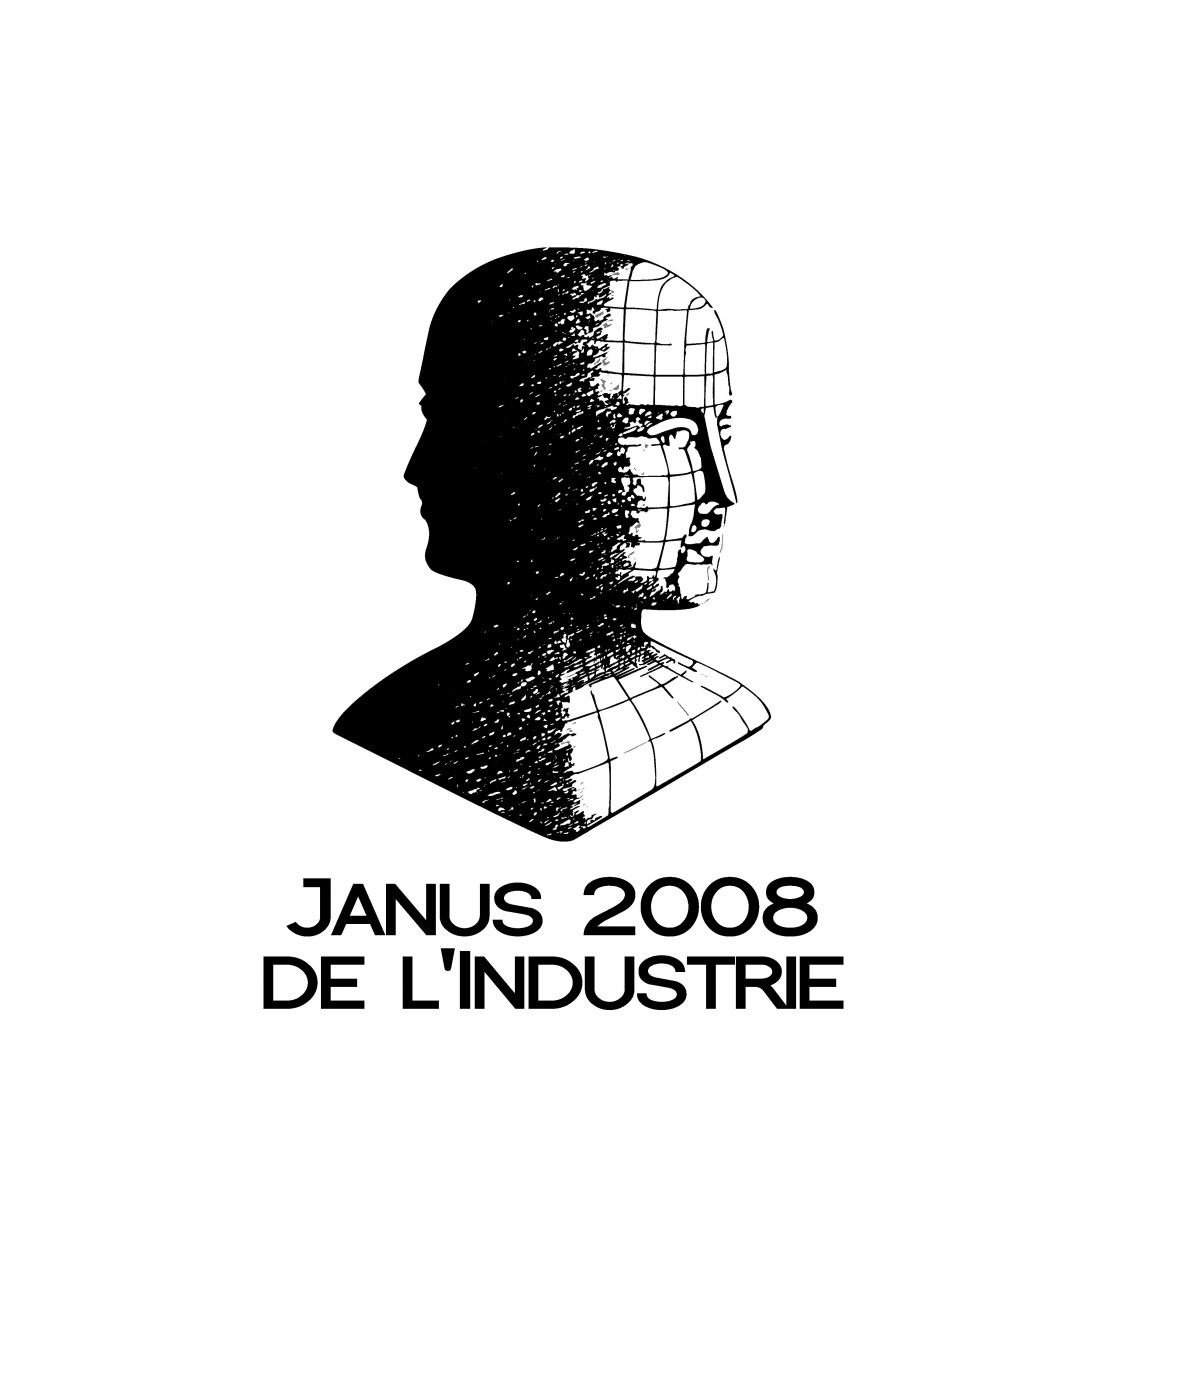 Kleslo - Fauteuil cinéma prix Janus